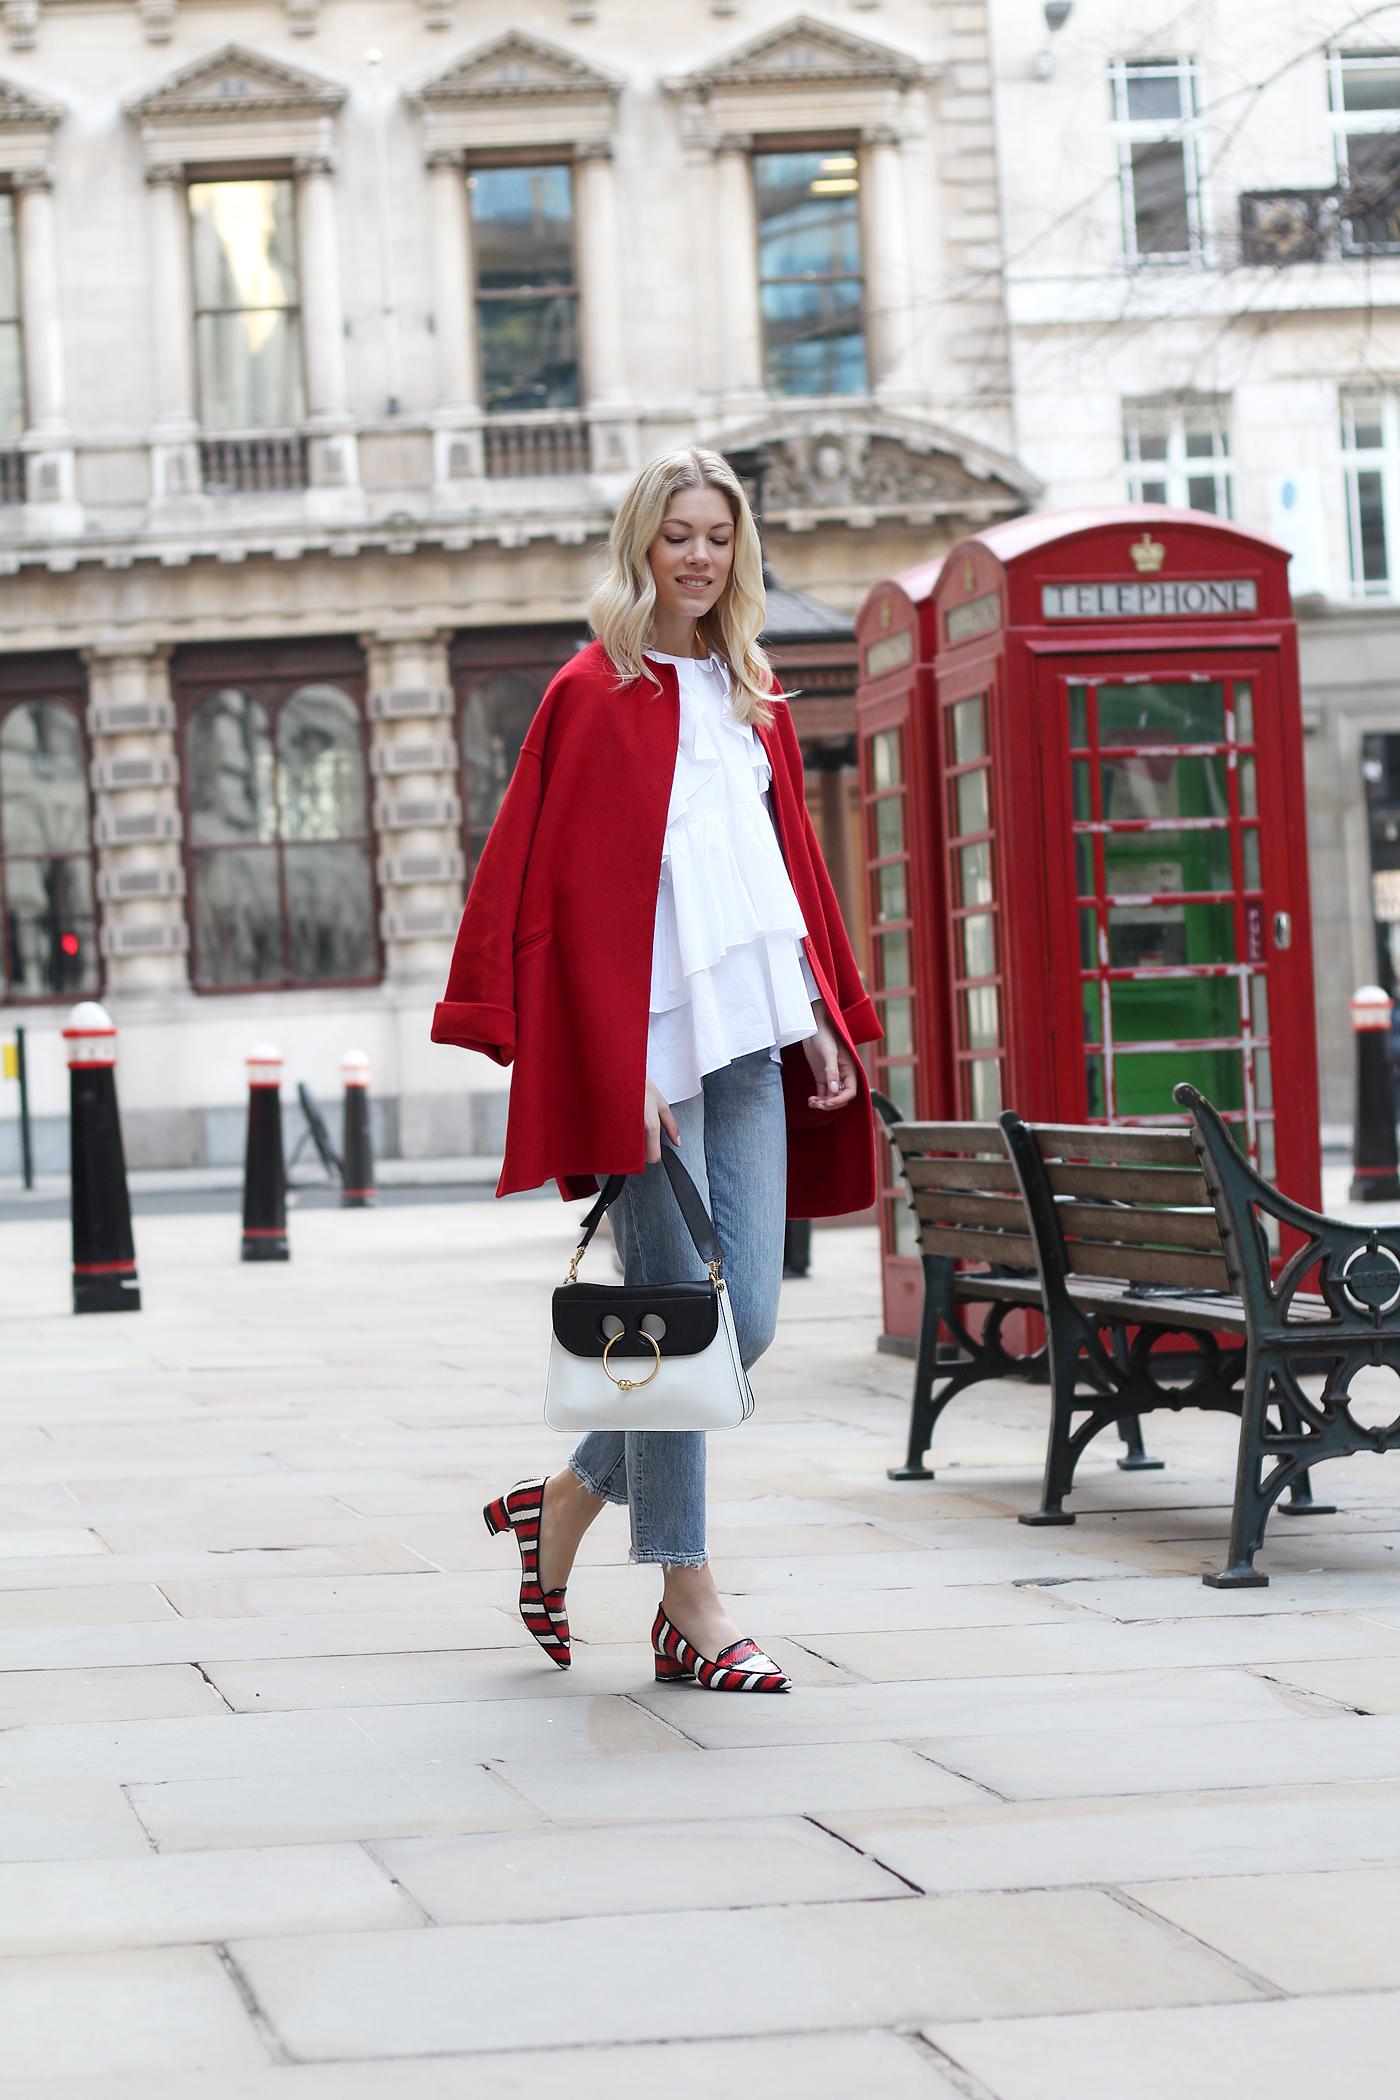 somehappyshoes_London_fashion_week_red_coat_Ganni_shoes_jeans2